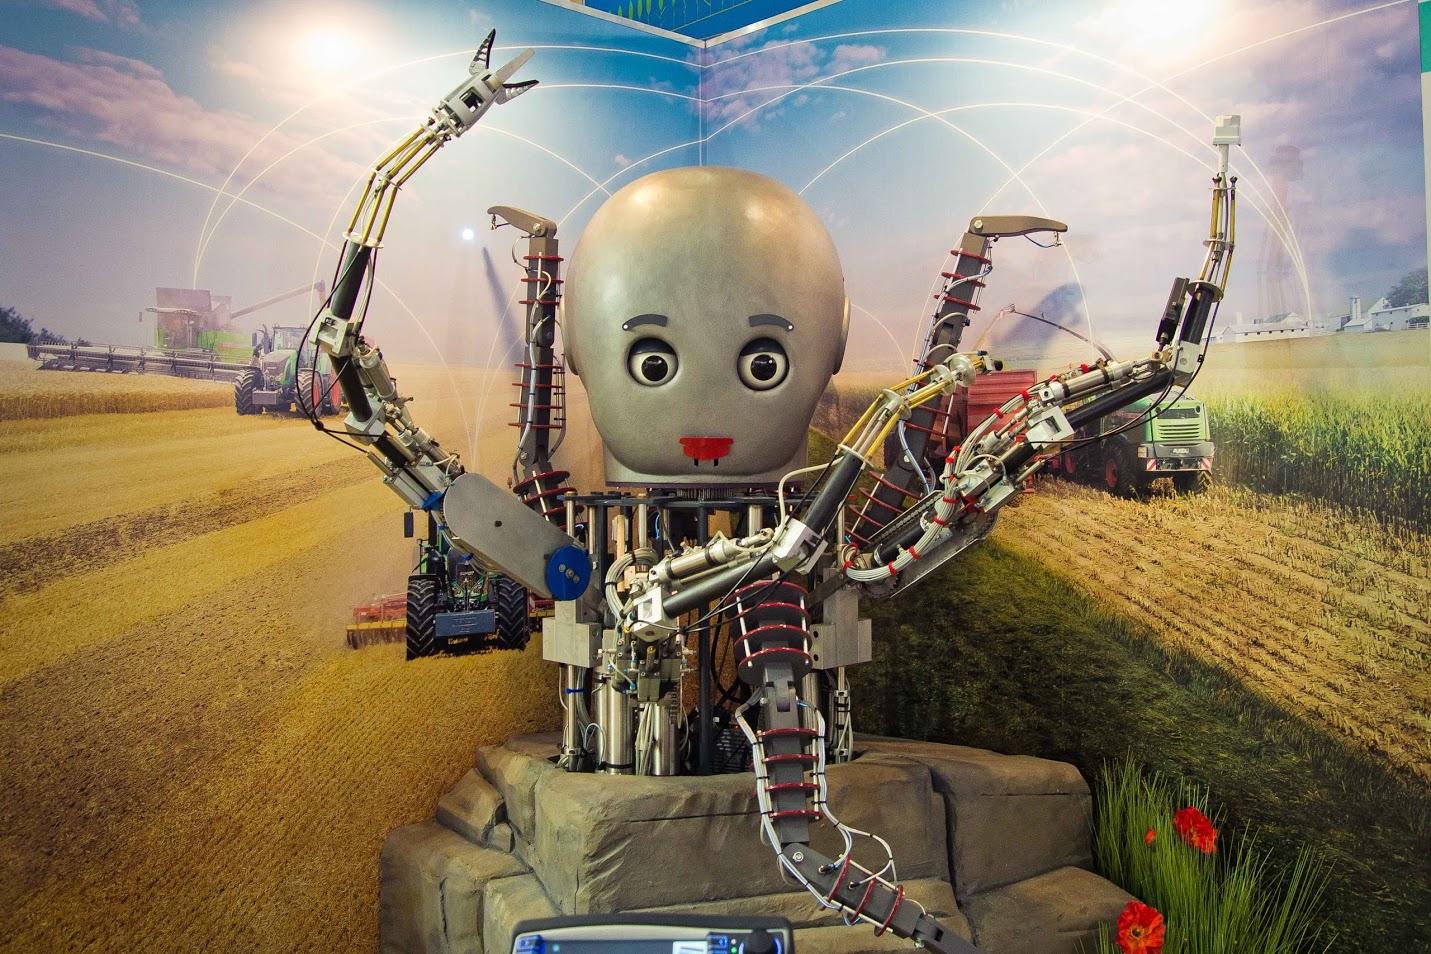 robot.jpg (426 KB)